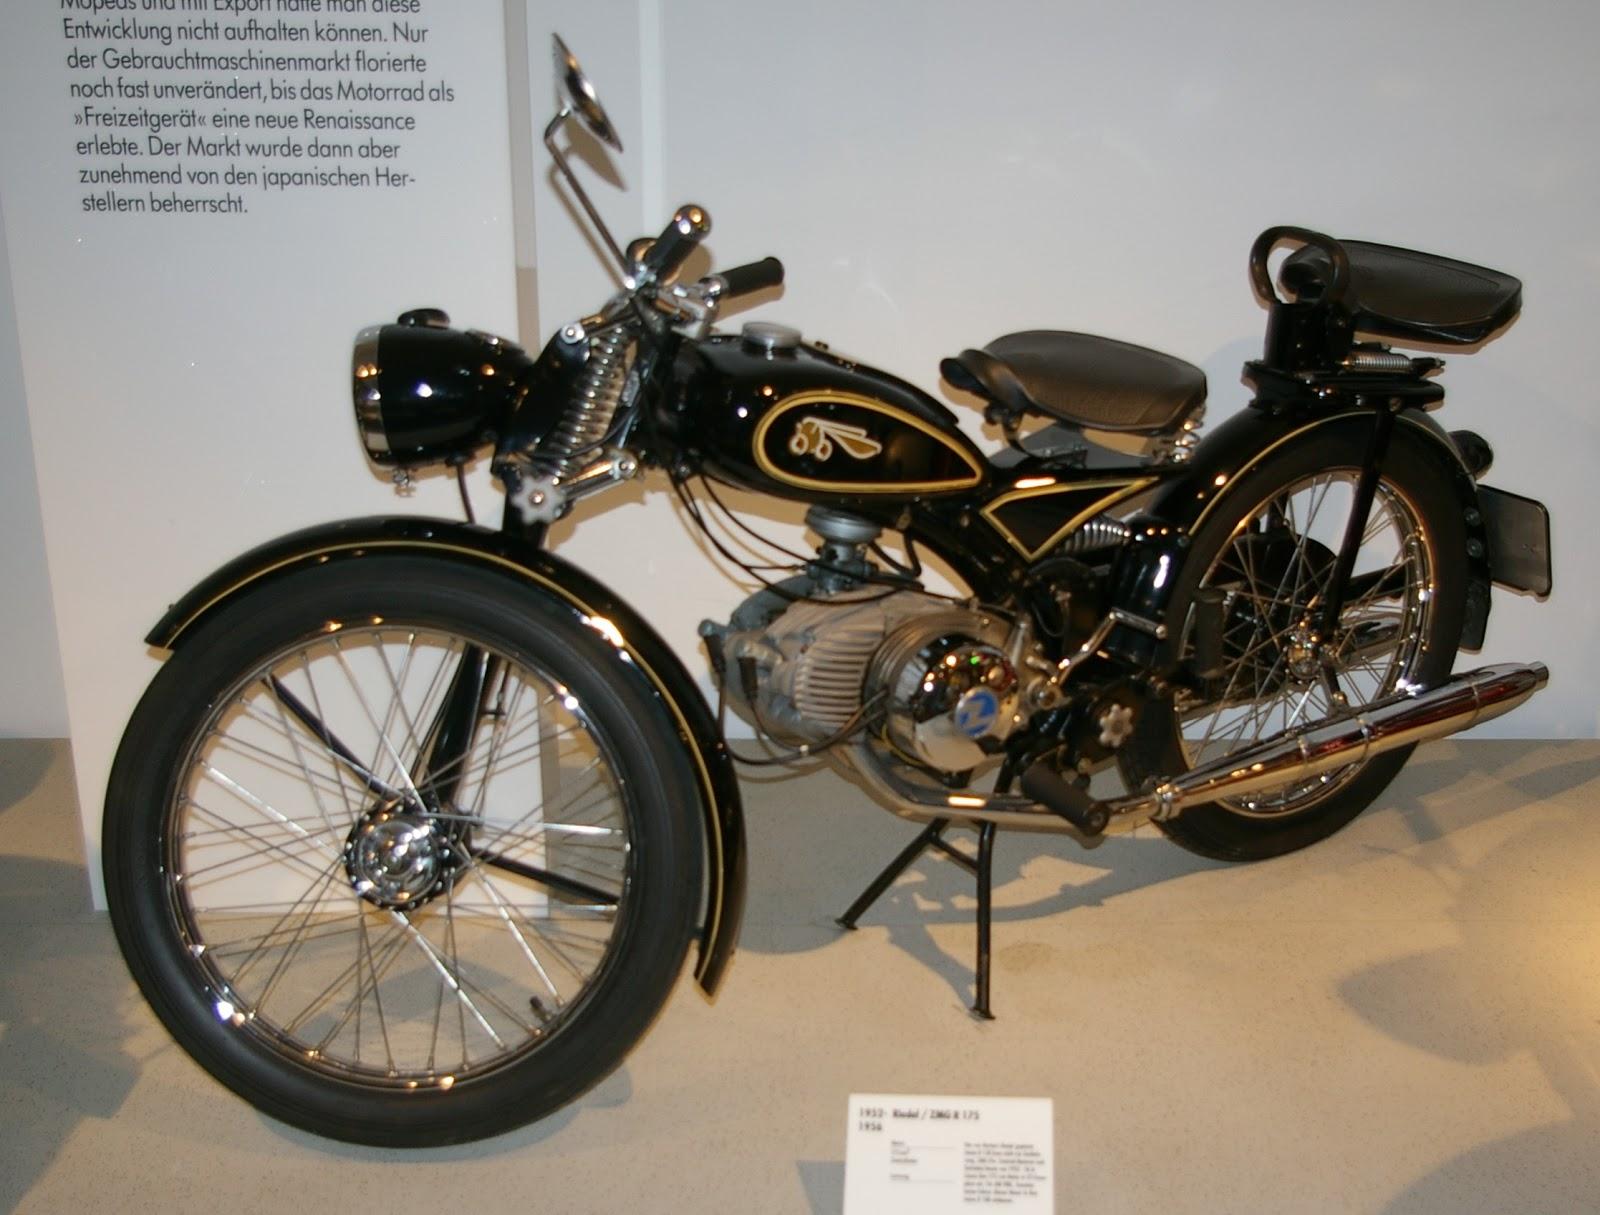 ZMG Imme R175 Twin Cylinder Motorbike